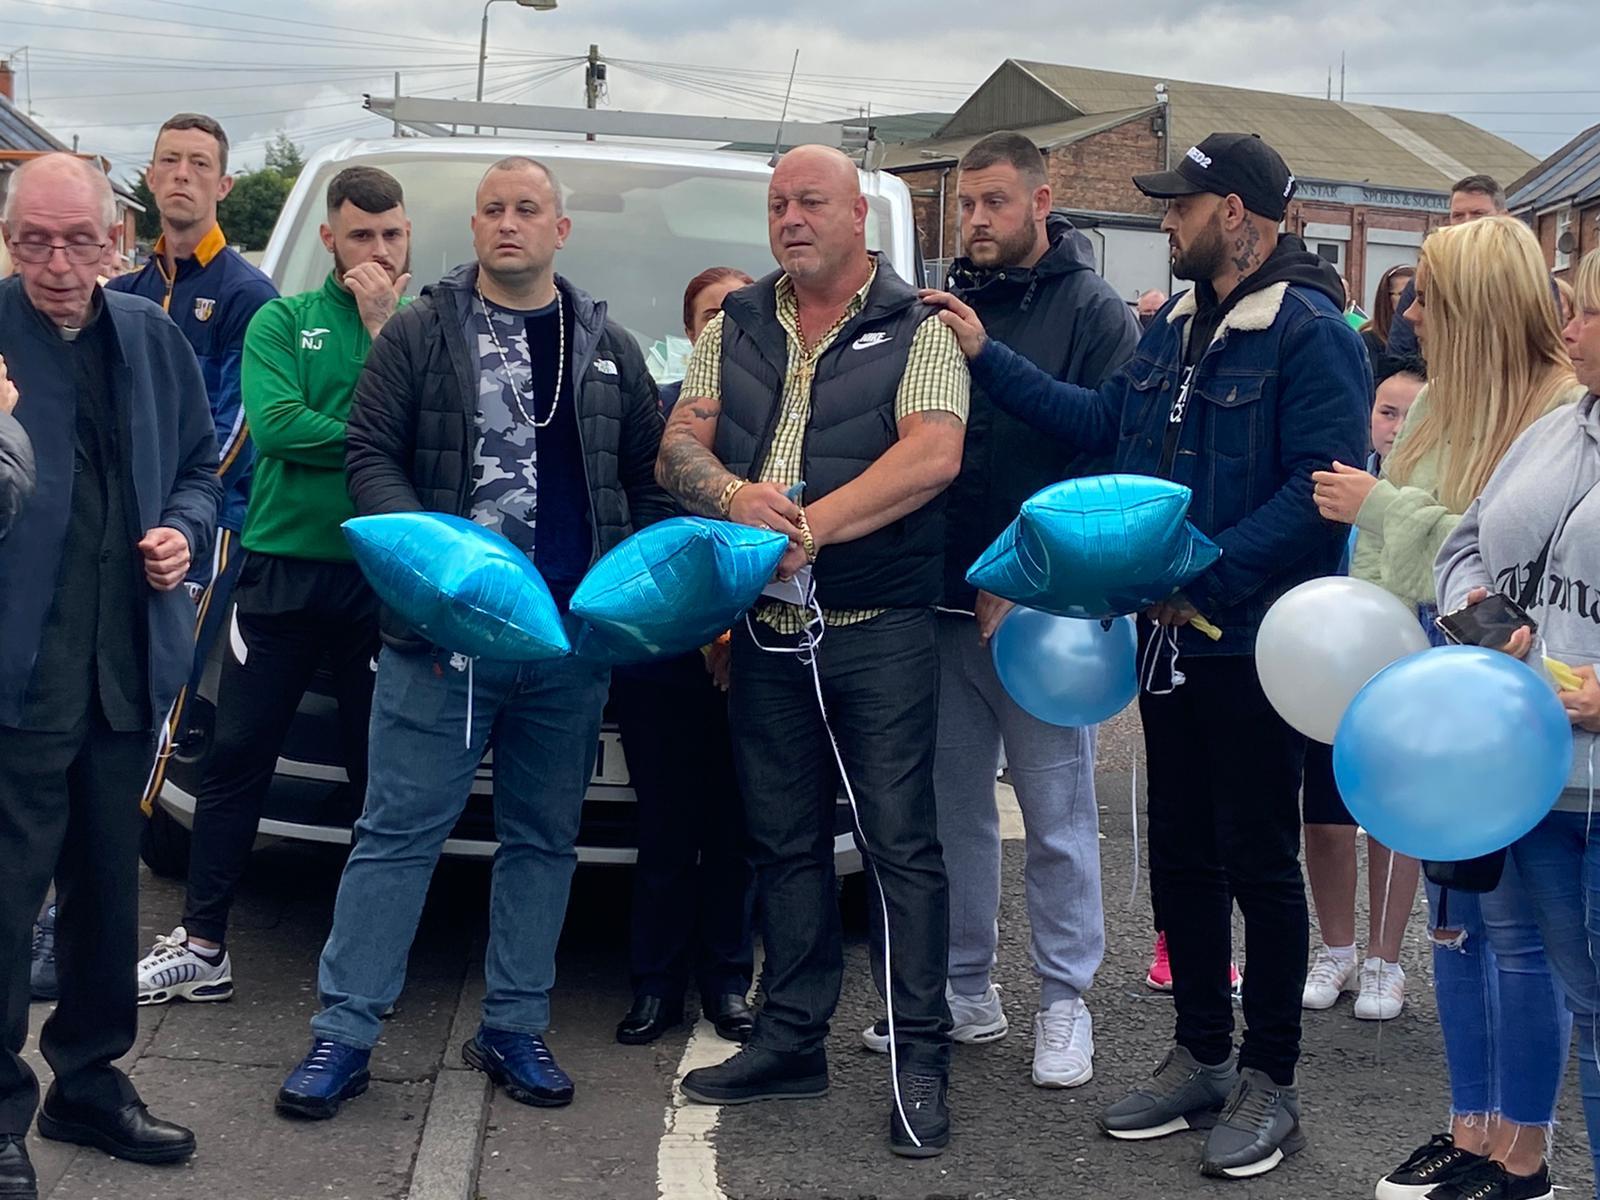 SUPPORT: Liam O\'Keefe Snr at the vigil in Ardoyne